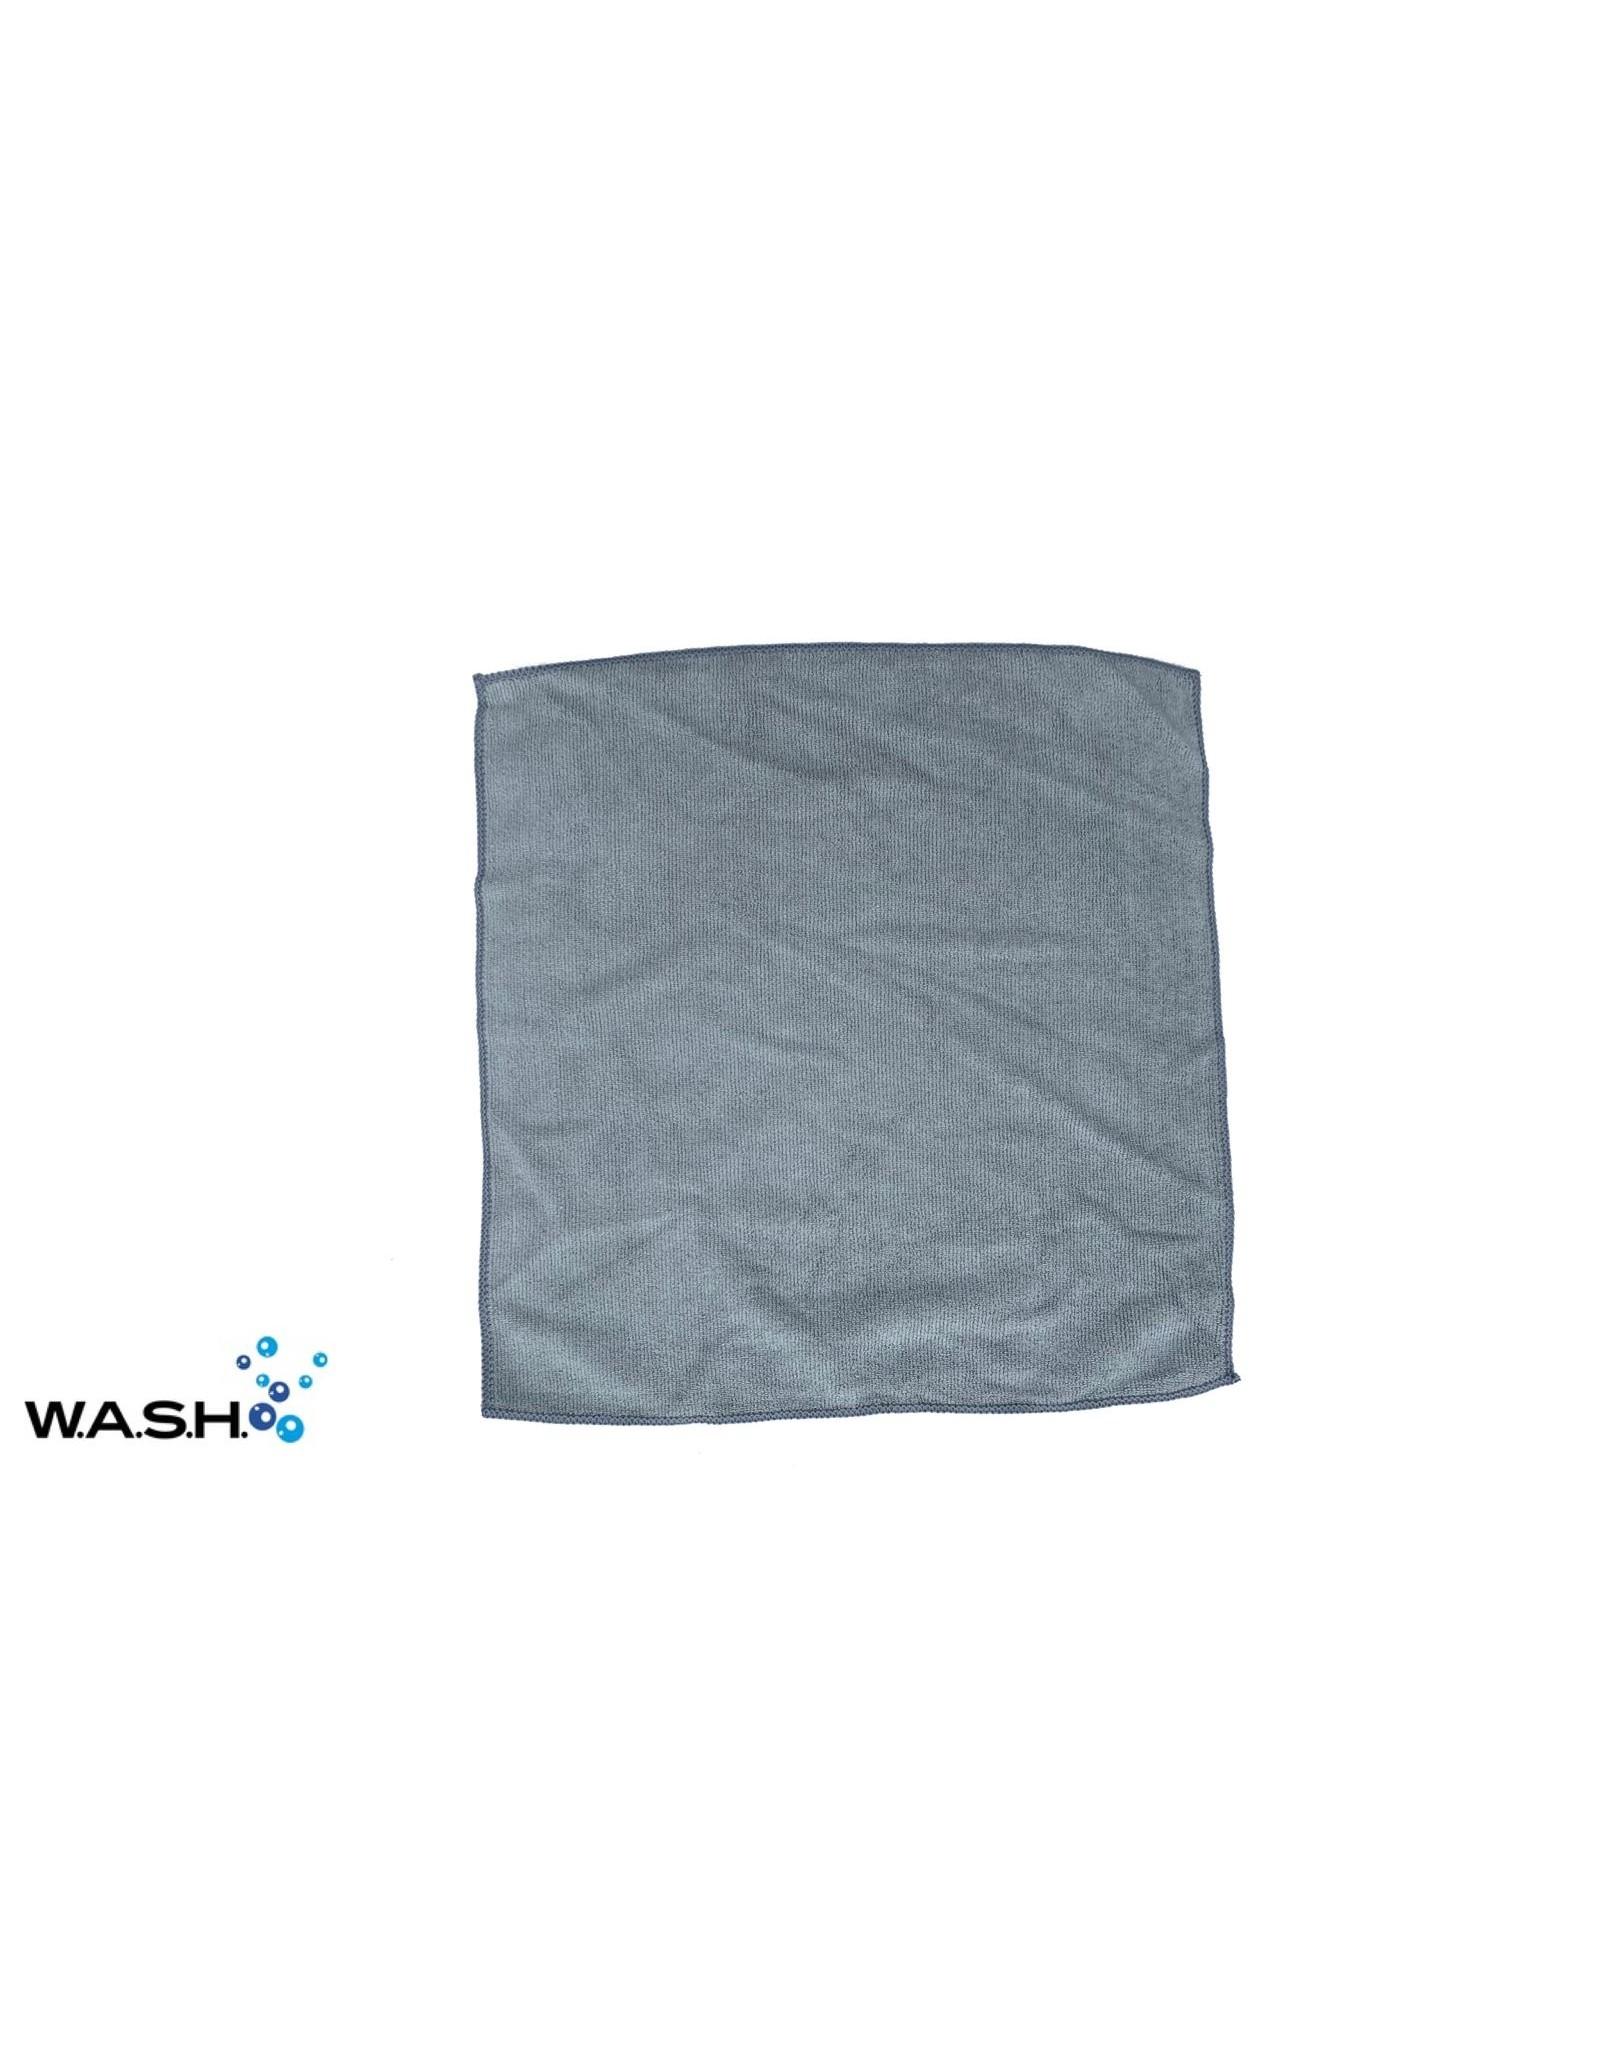 W.A.S.H. W.A.S.H. POETSDOEK Microvezel Stof Grijs 40x40 cm - 1 stuk